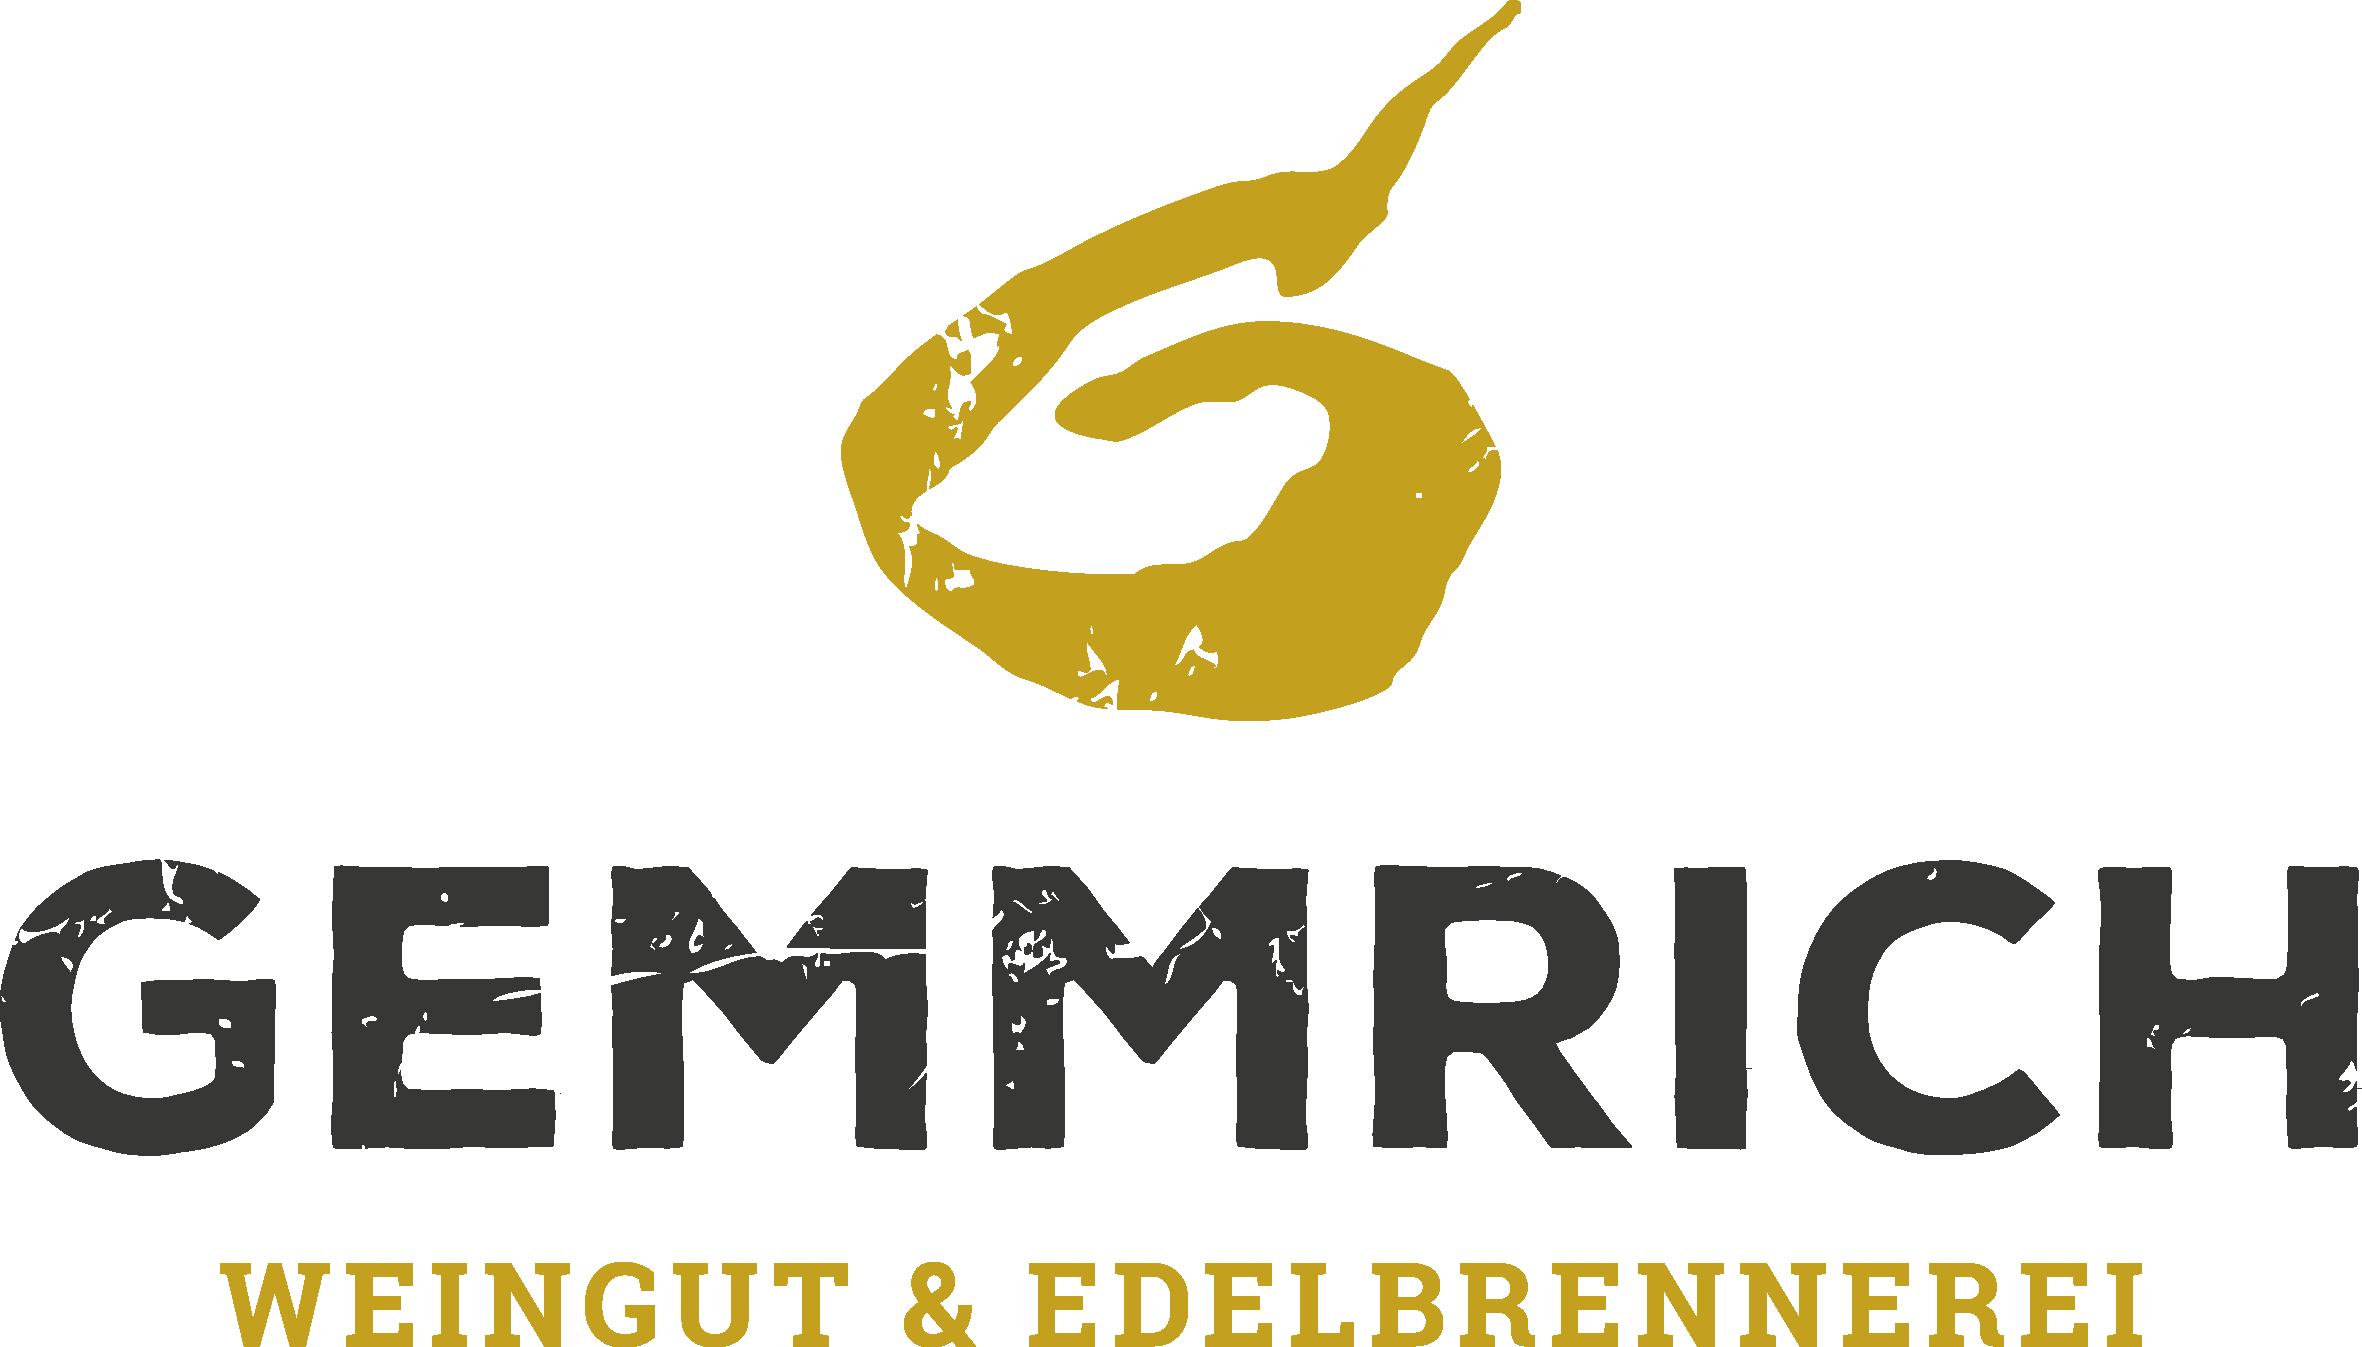 Weingut & Edelbrennerei Gemmrich